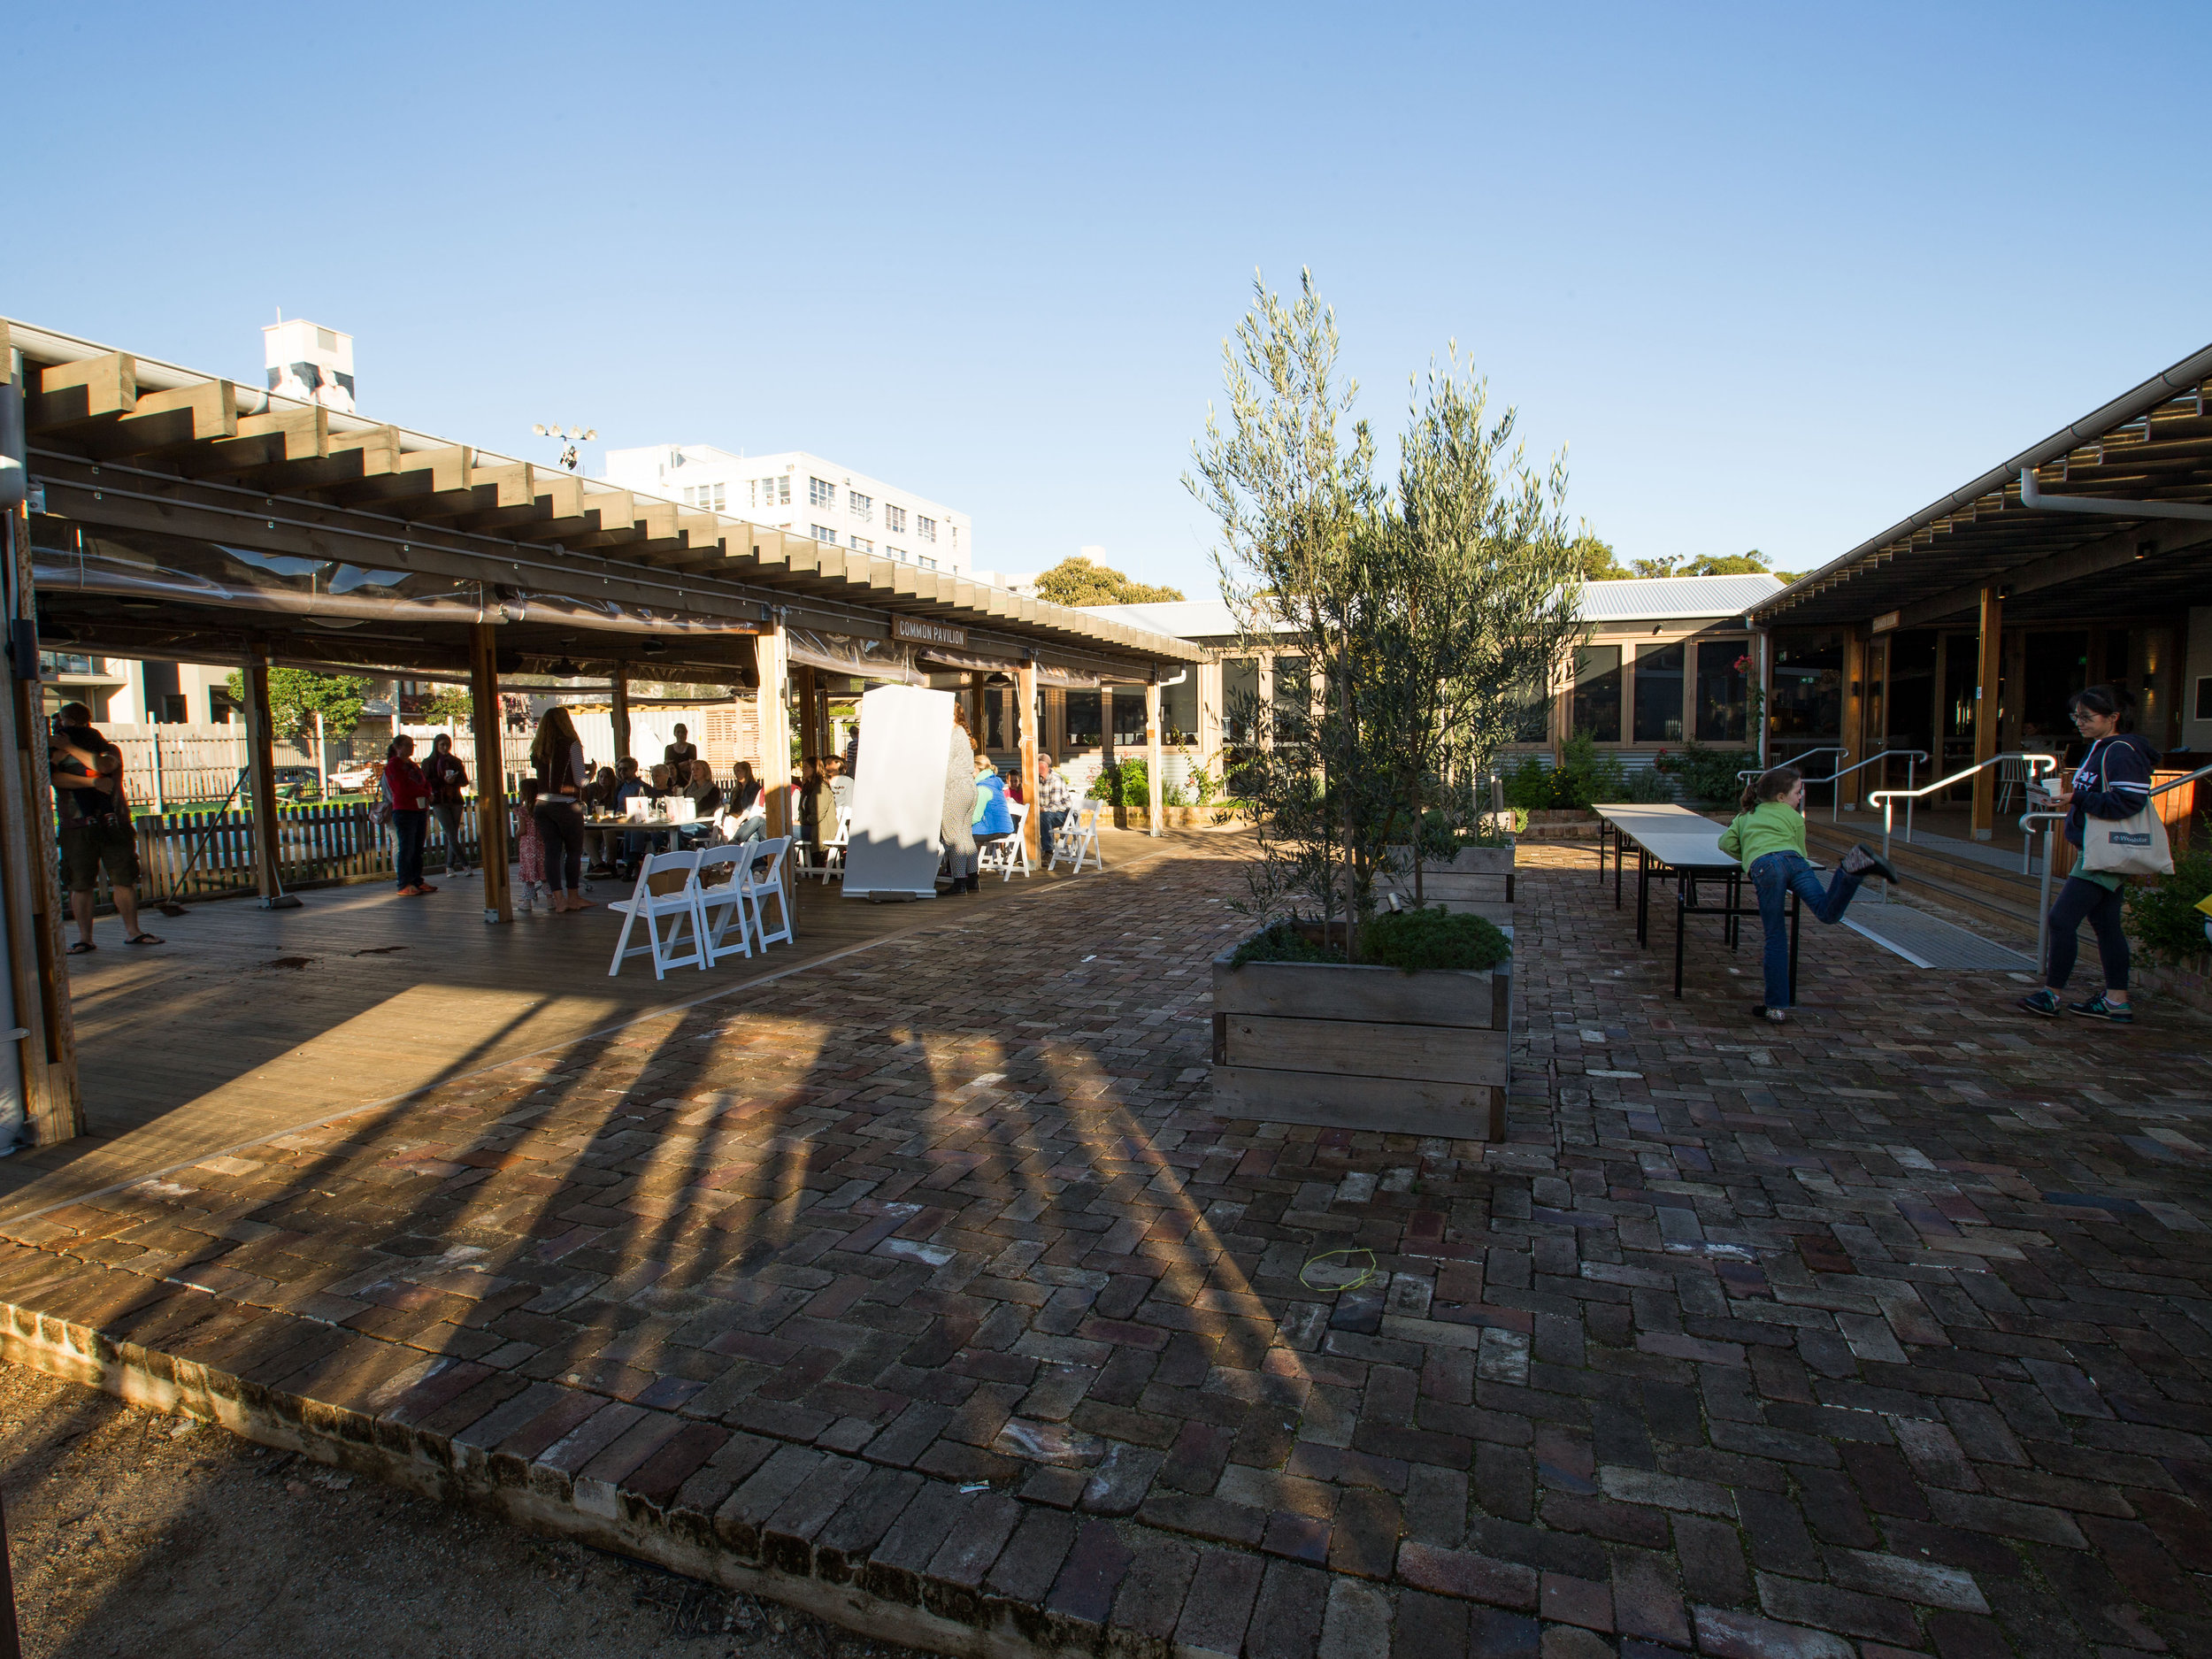 commonspaces-courtyard2.jpg